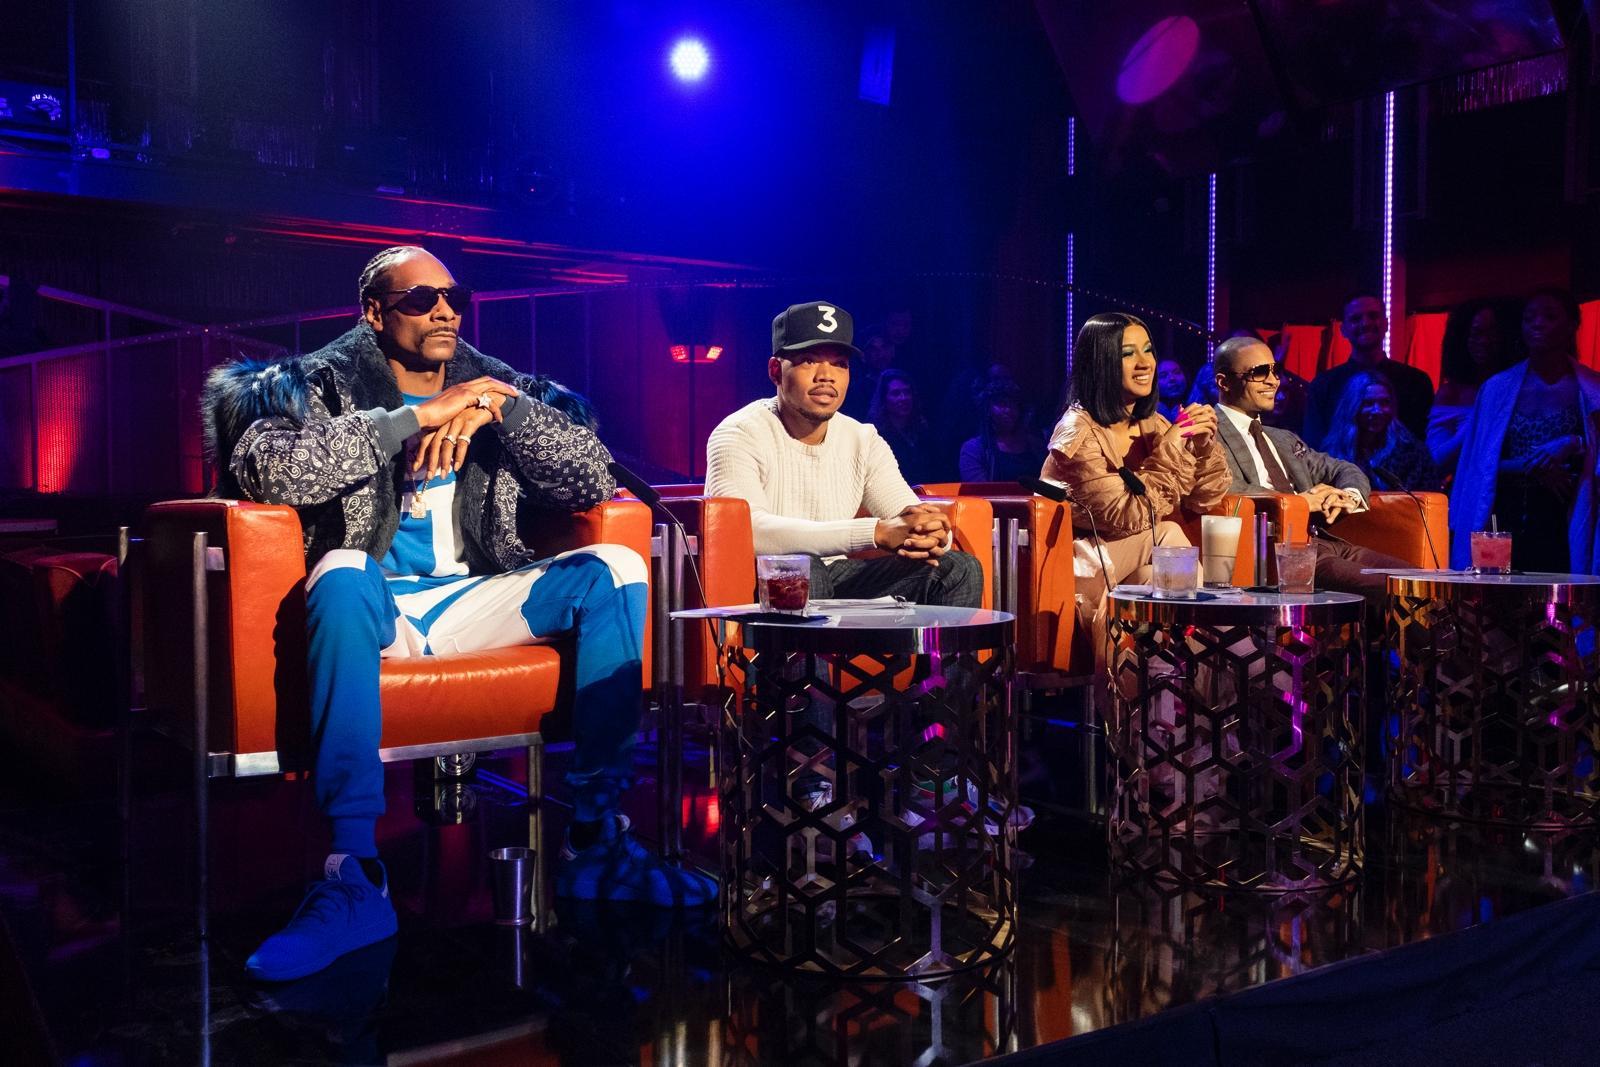 Hängengeblieben 2019 Rap